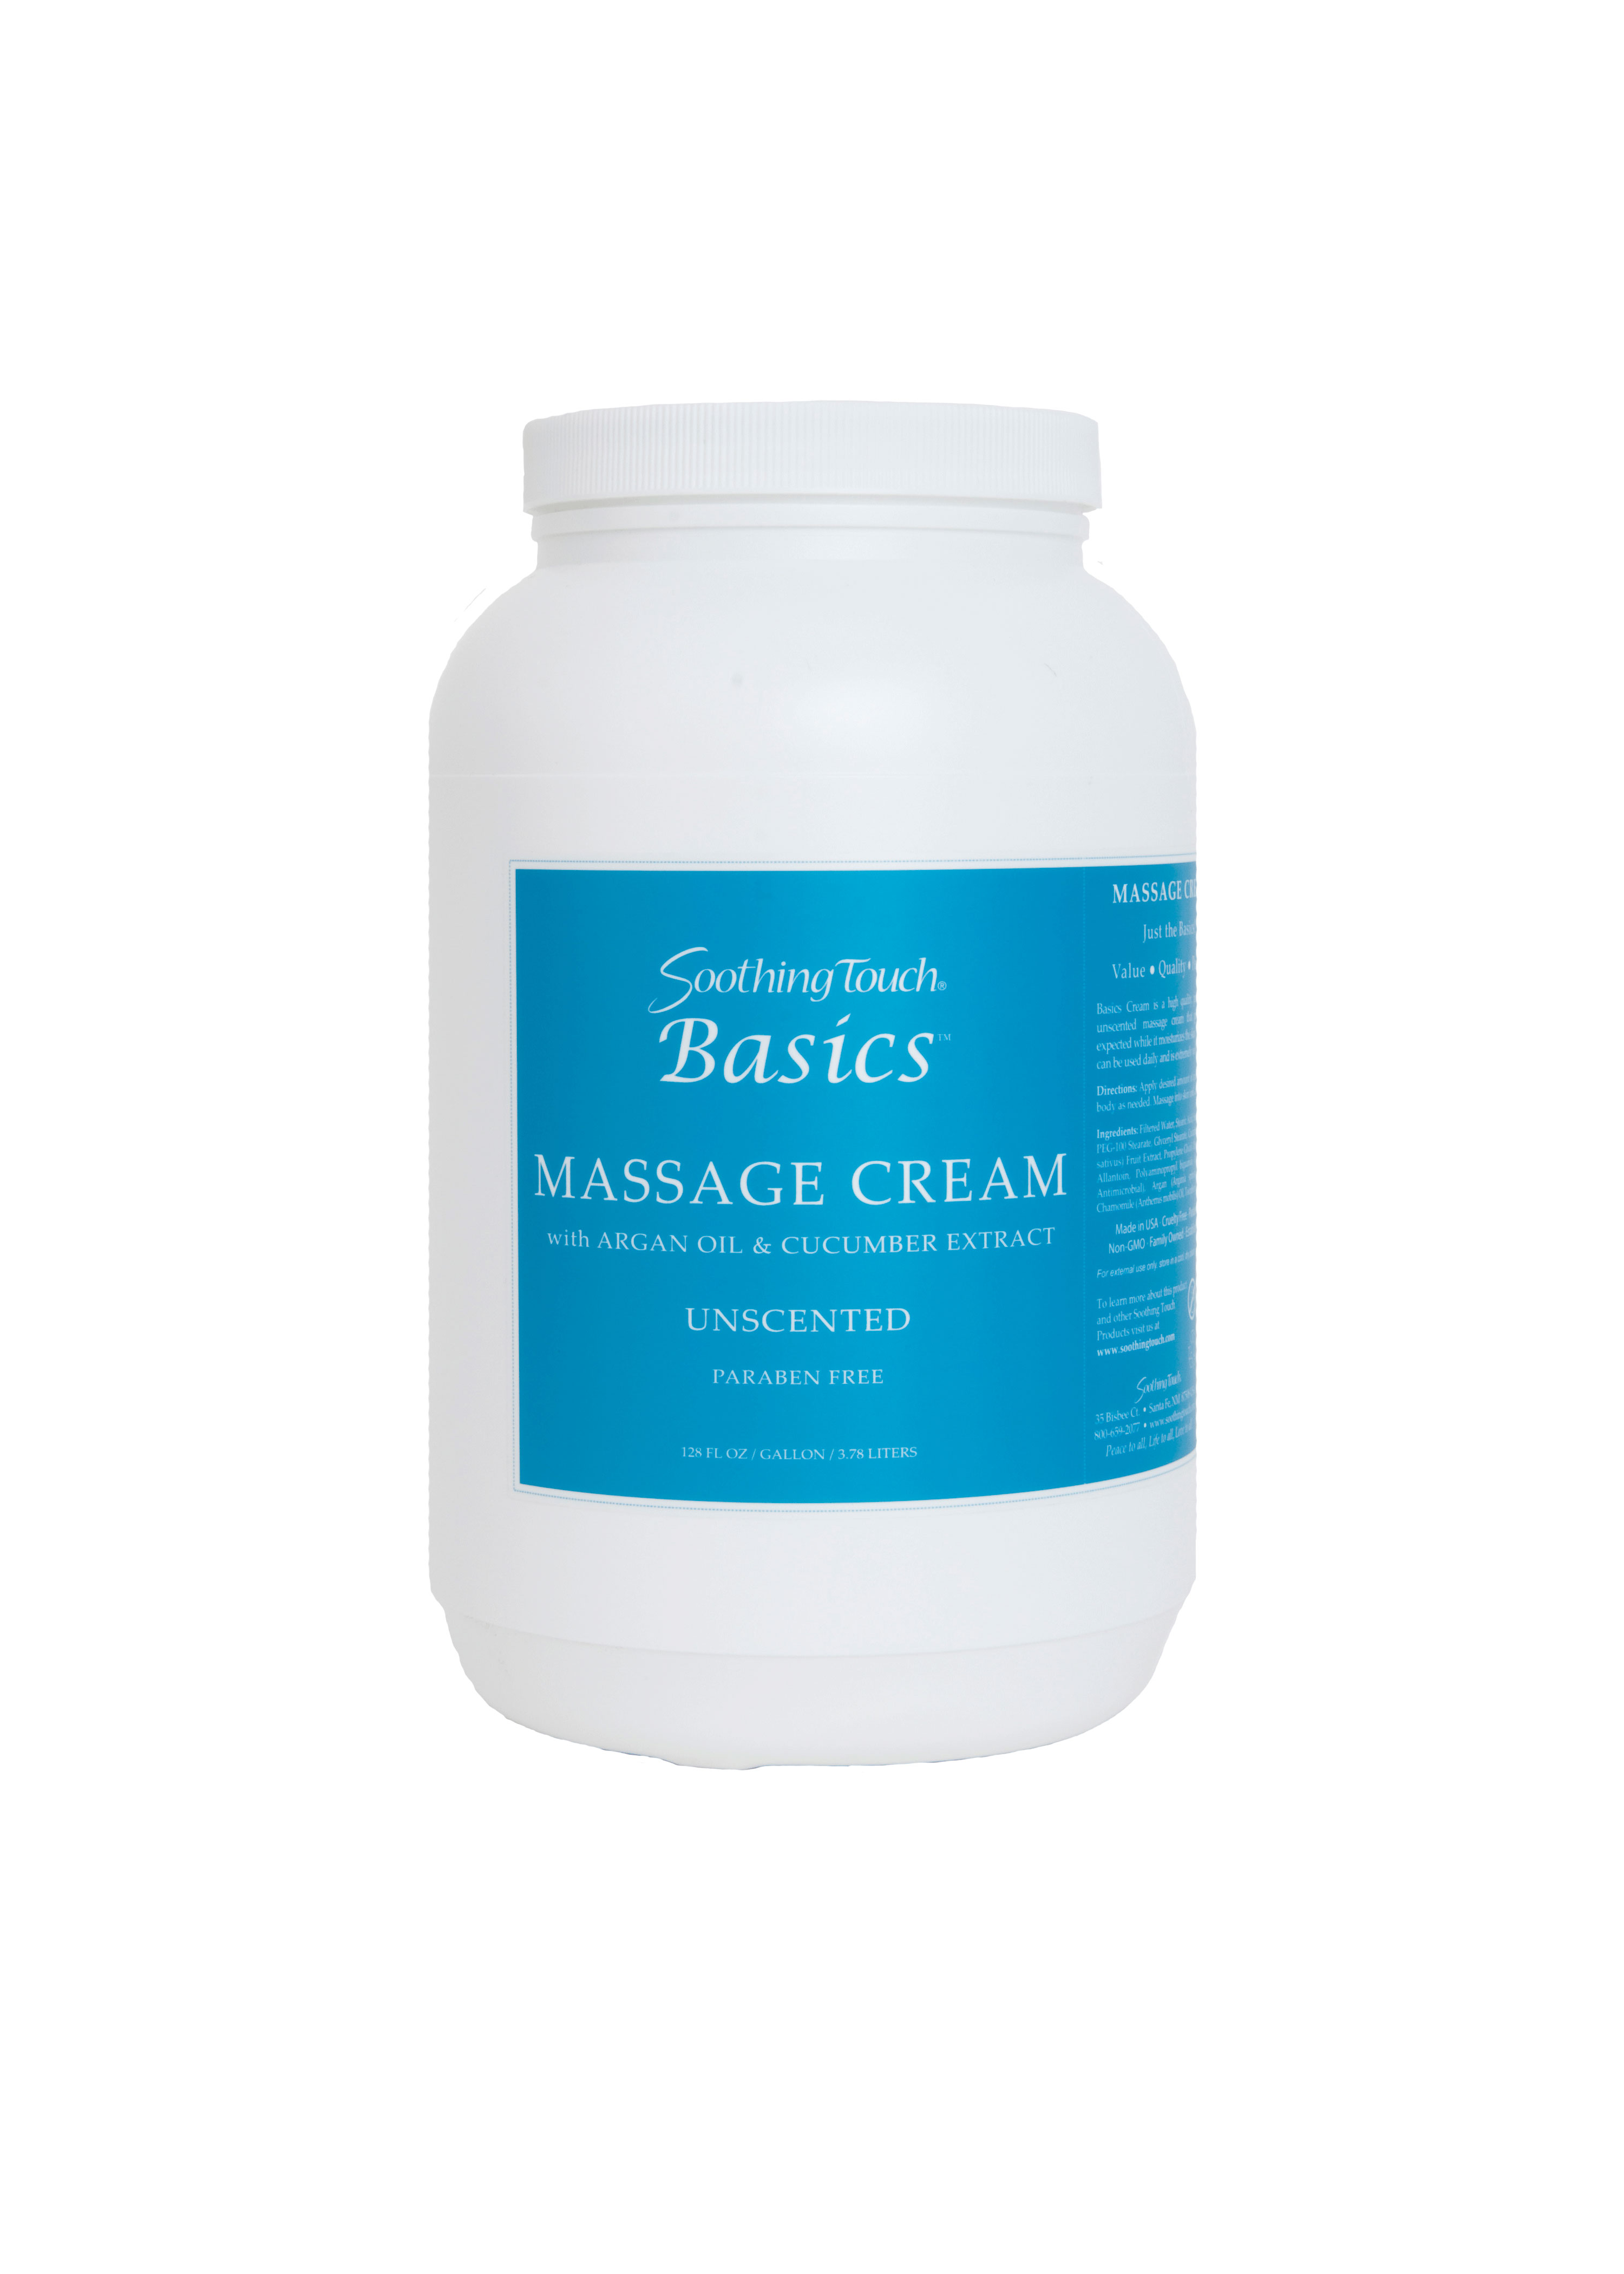 Soothing Touch Basics Massage Cream